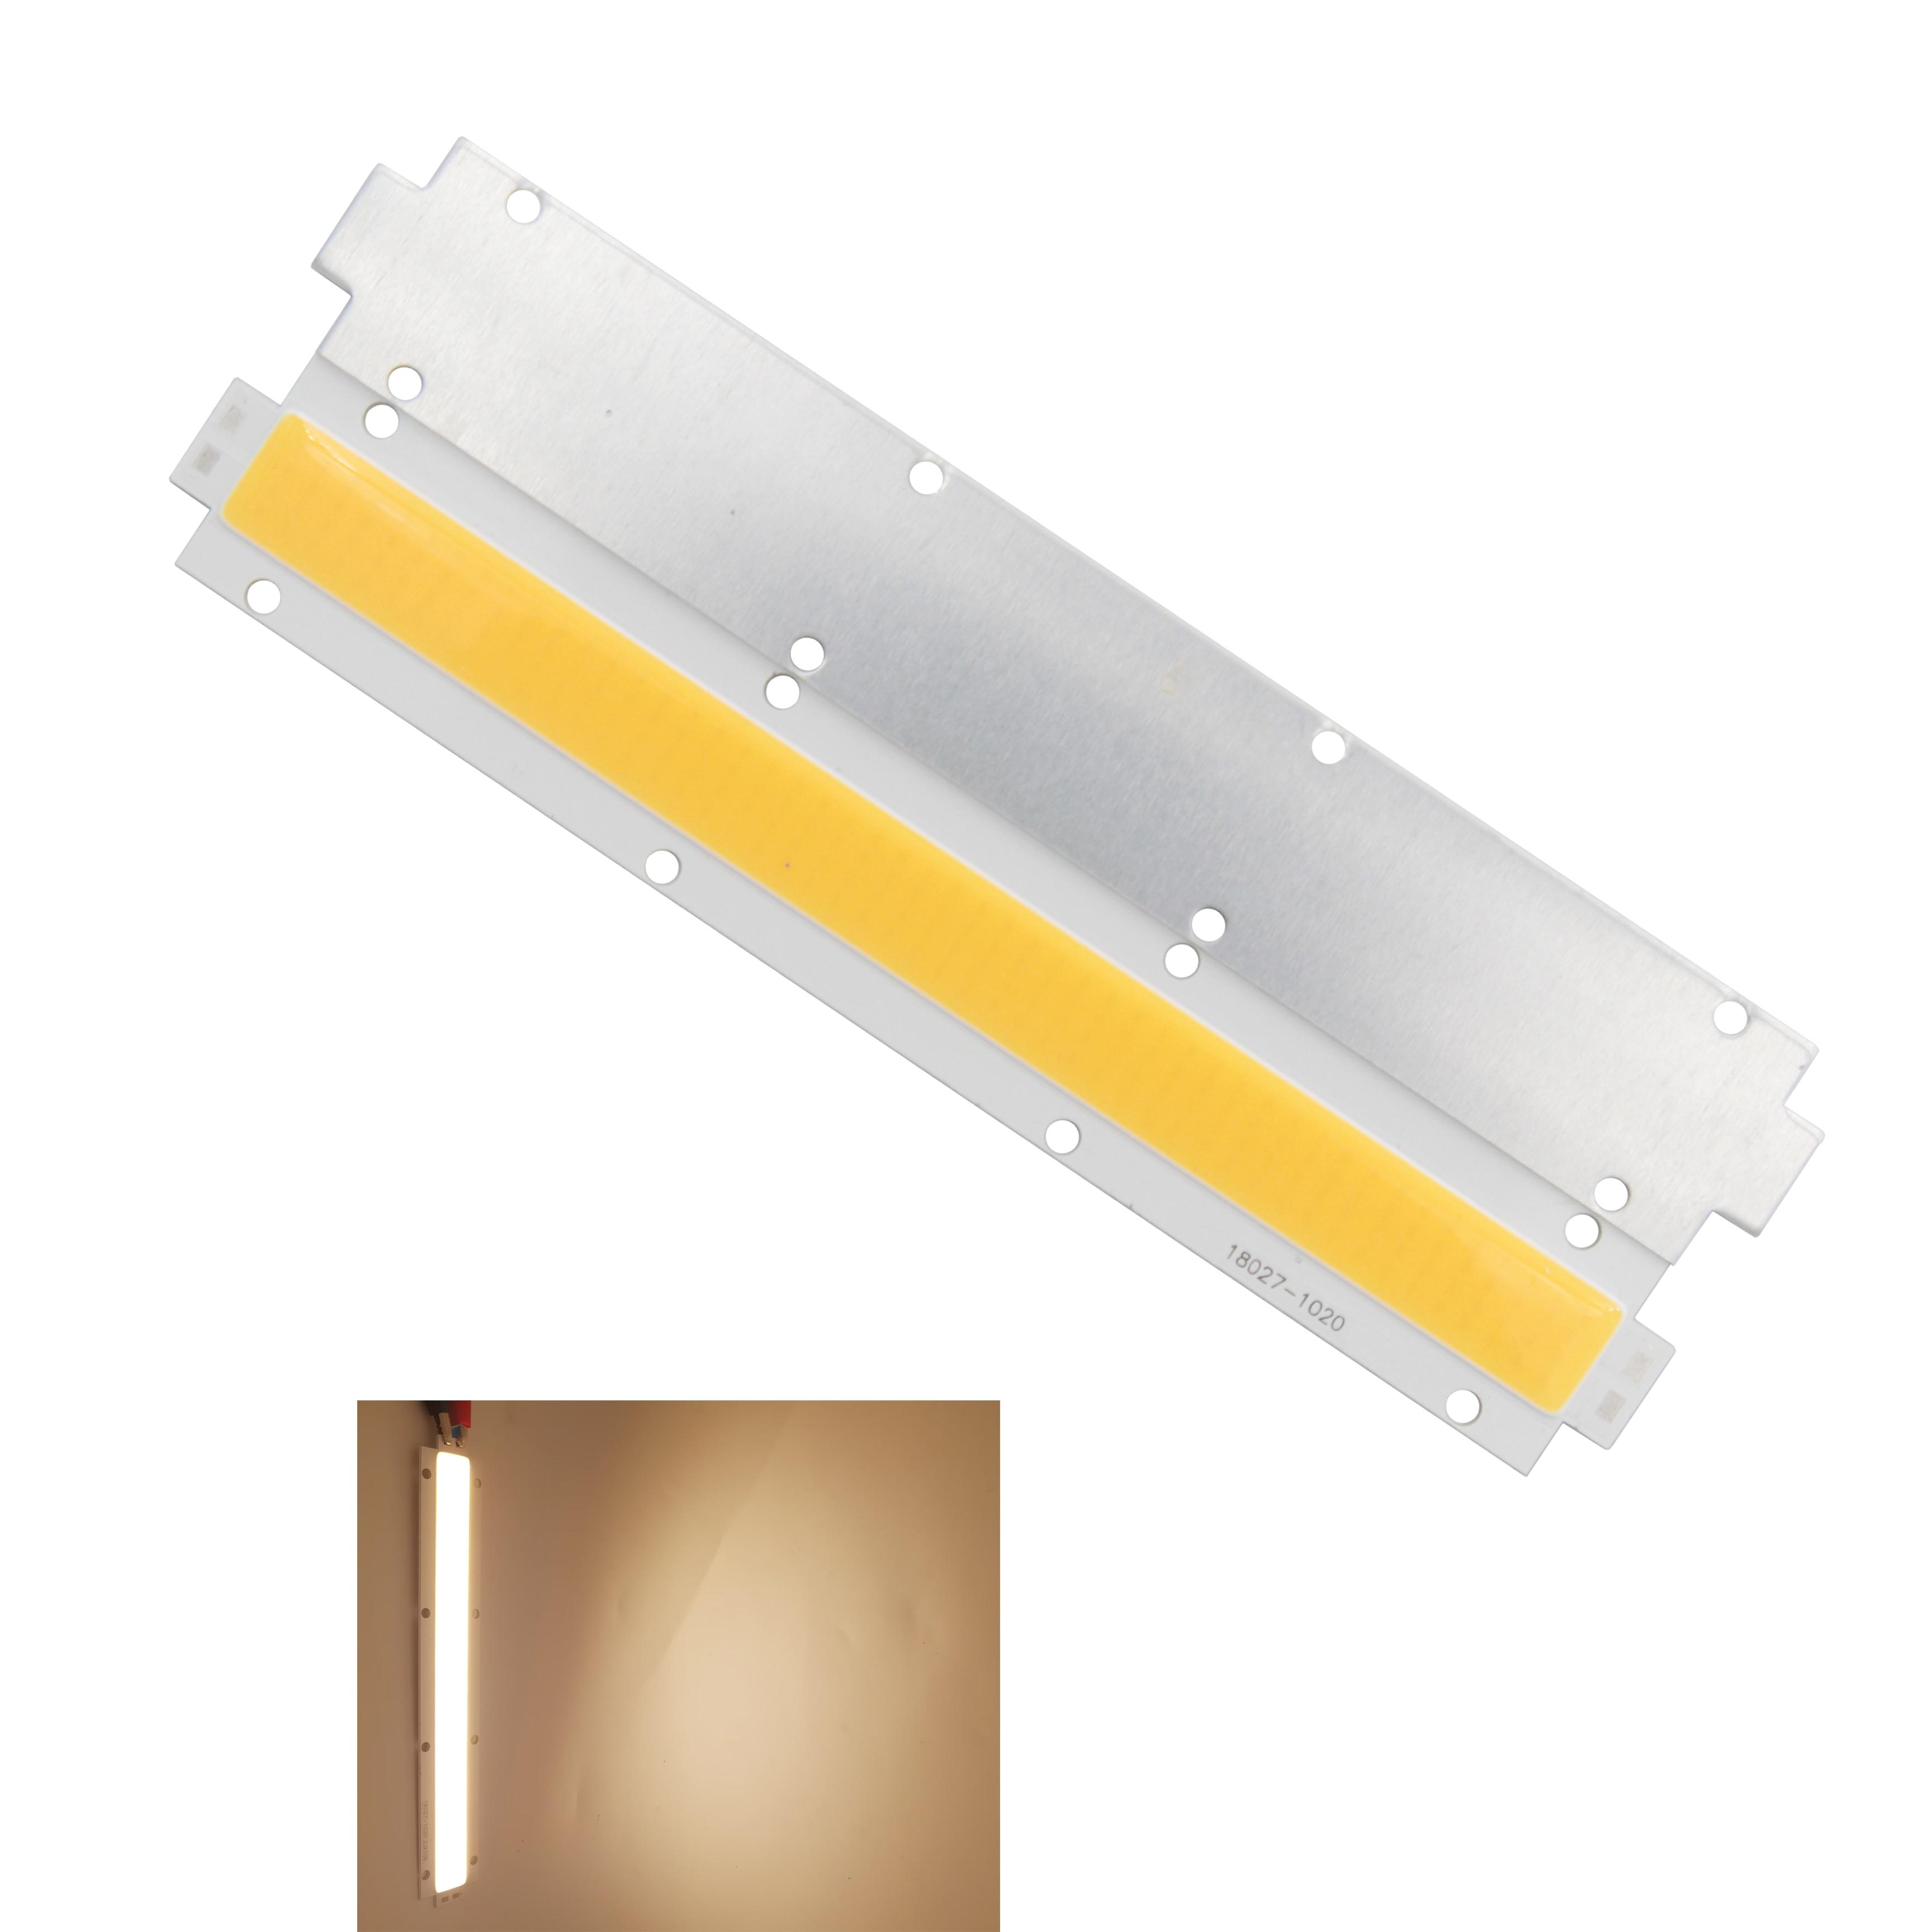 Купить с кэшбэком hot sale high power LED COB Strip 30-33V DC outdoor multifunction 100W 180mm 27mm Warm White LED FLIP Chip Light Source